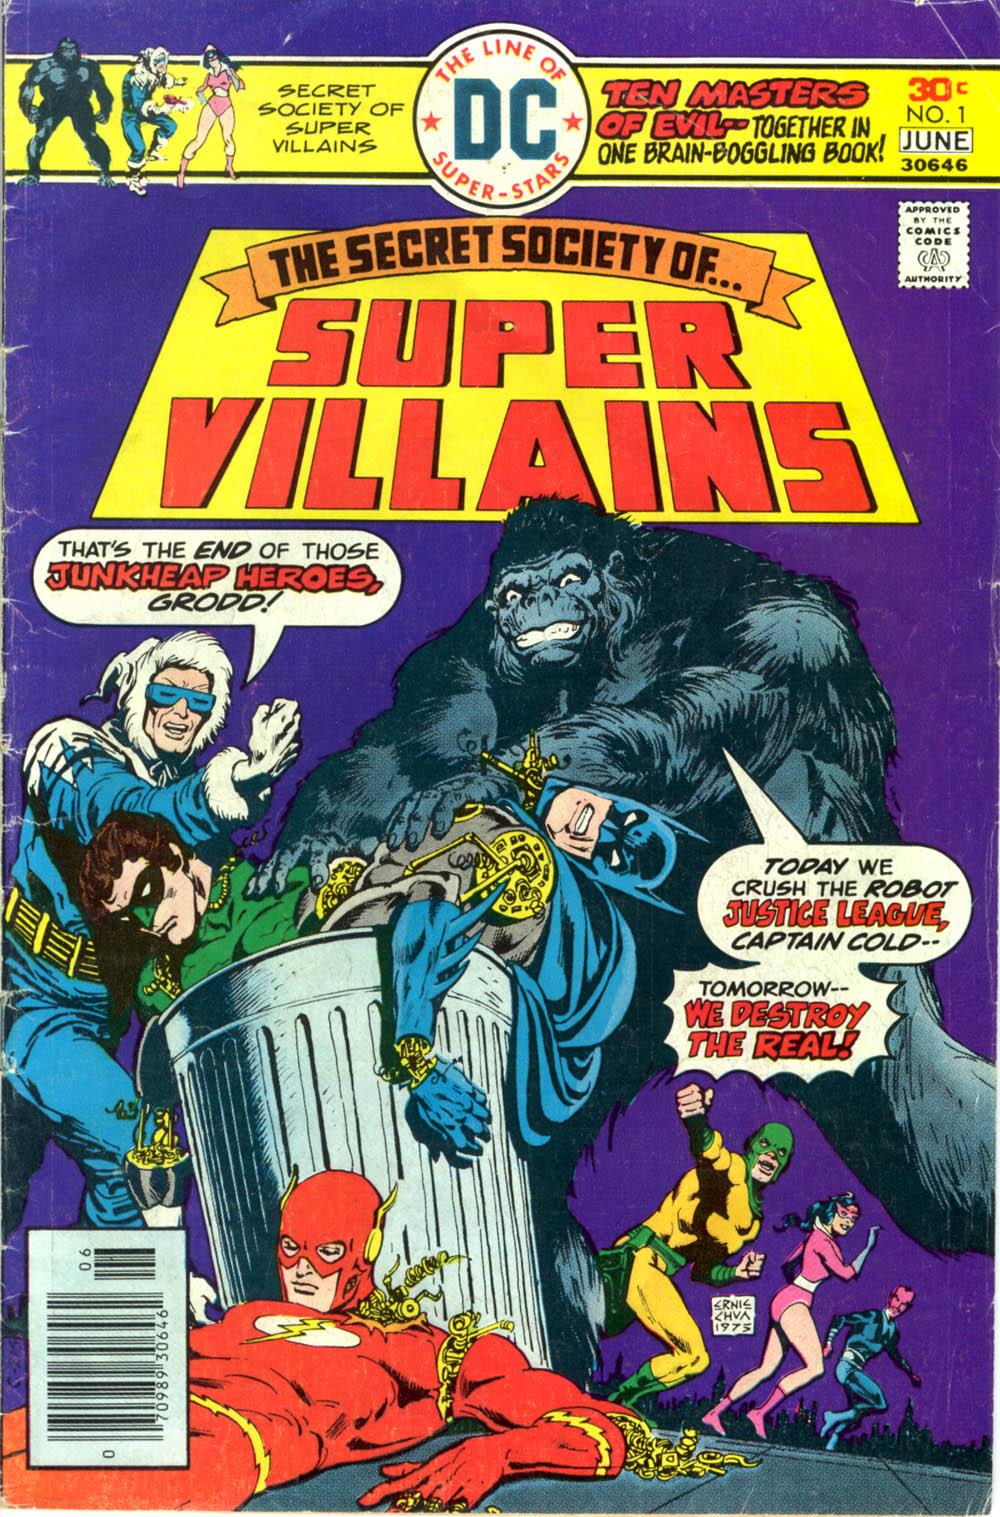 Read online Secret Society of Super-Villains comic -  Issue #1 - 1